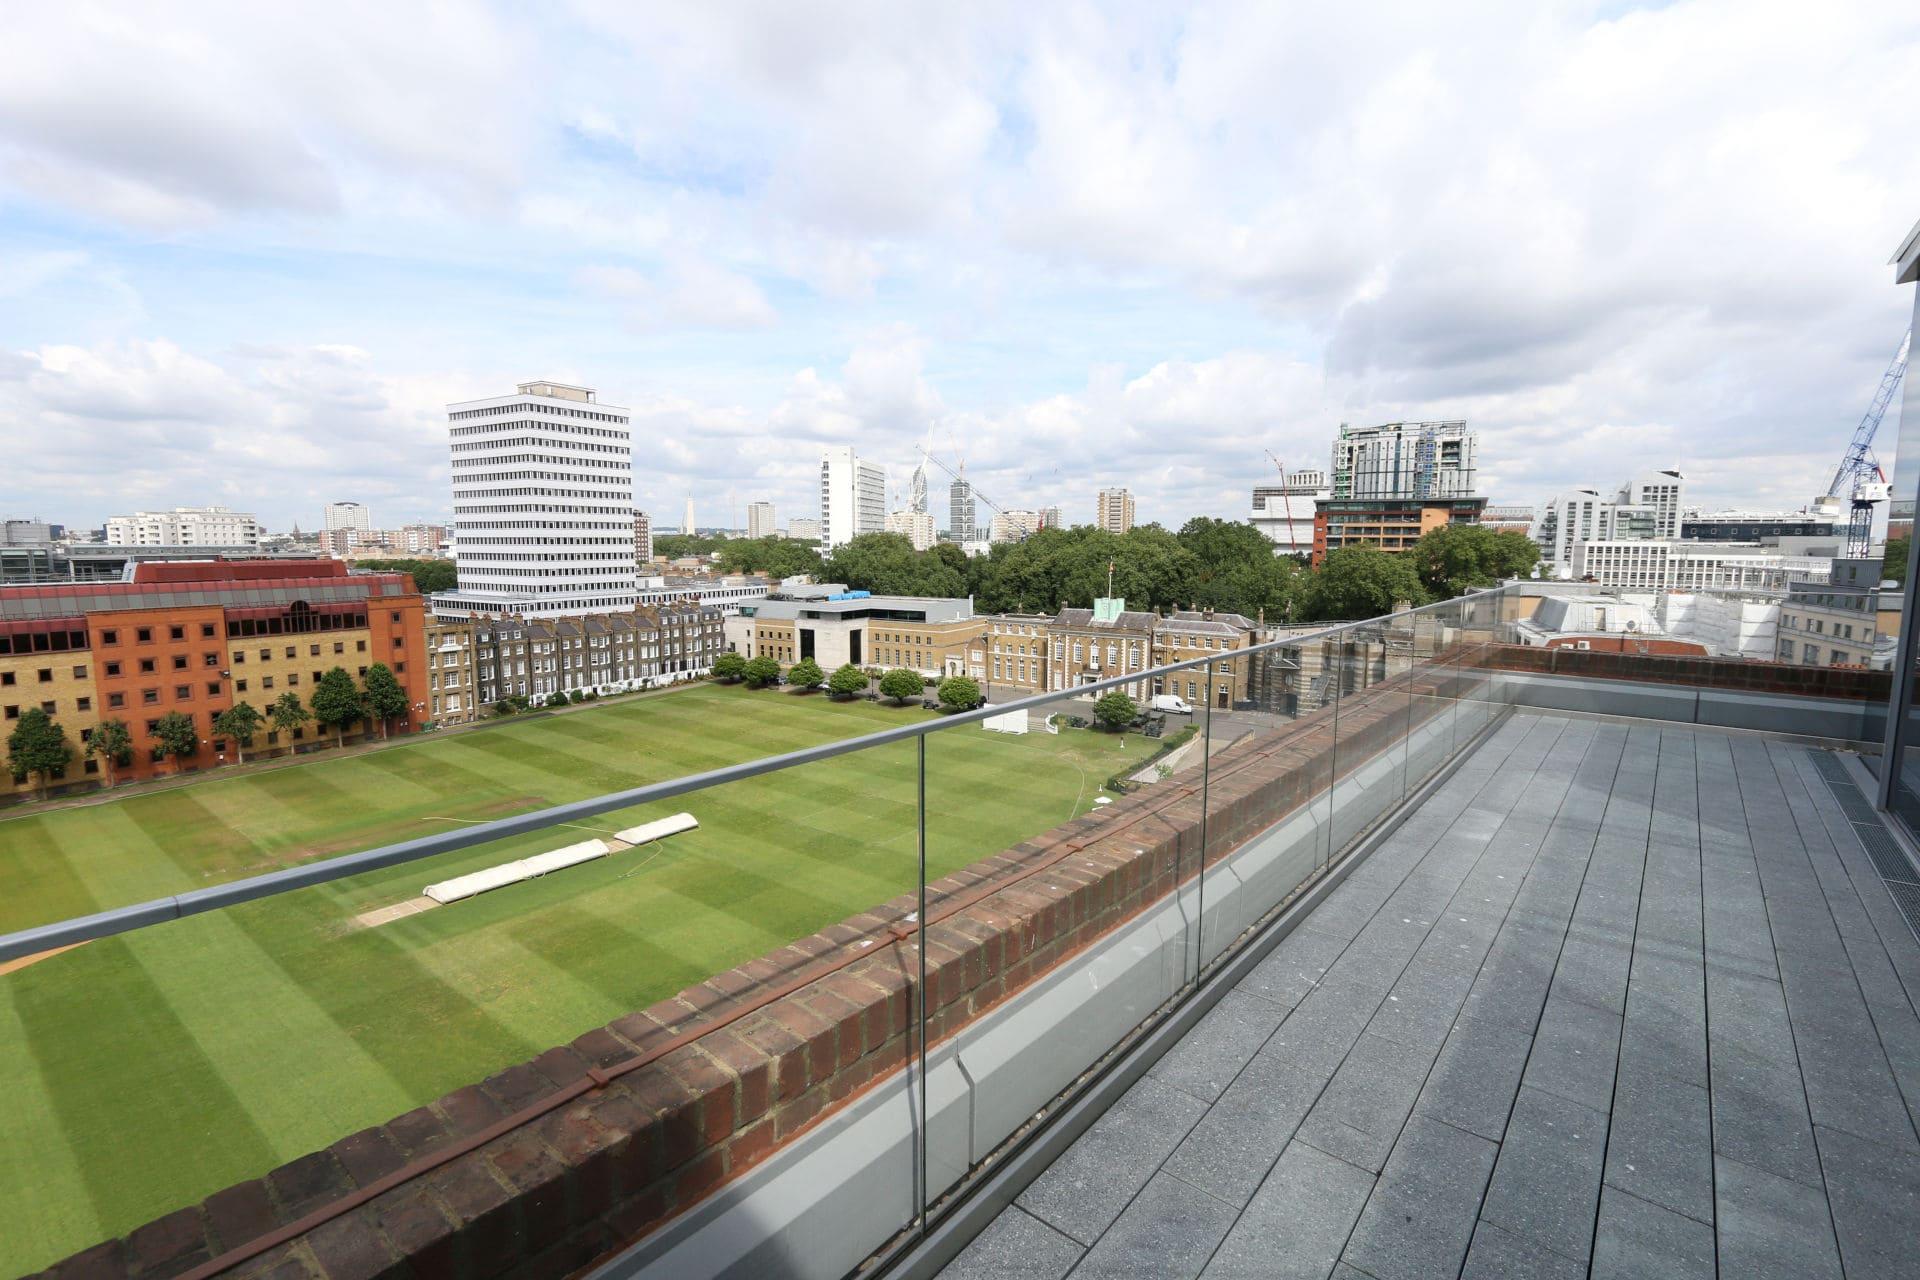 View of Cricket Pitch through frameless glass balustrade